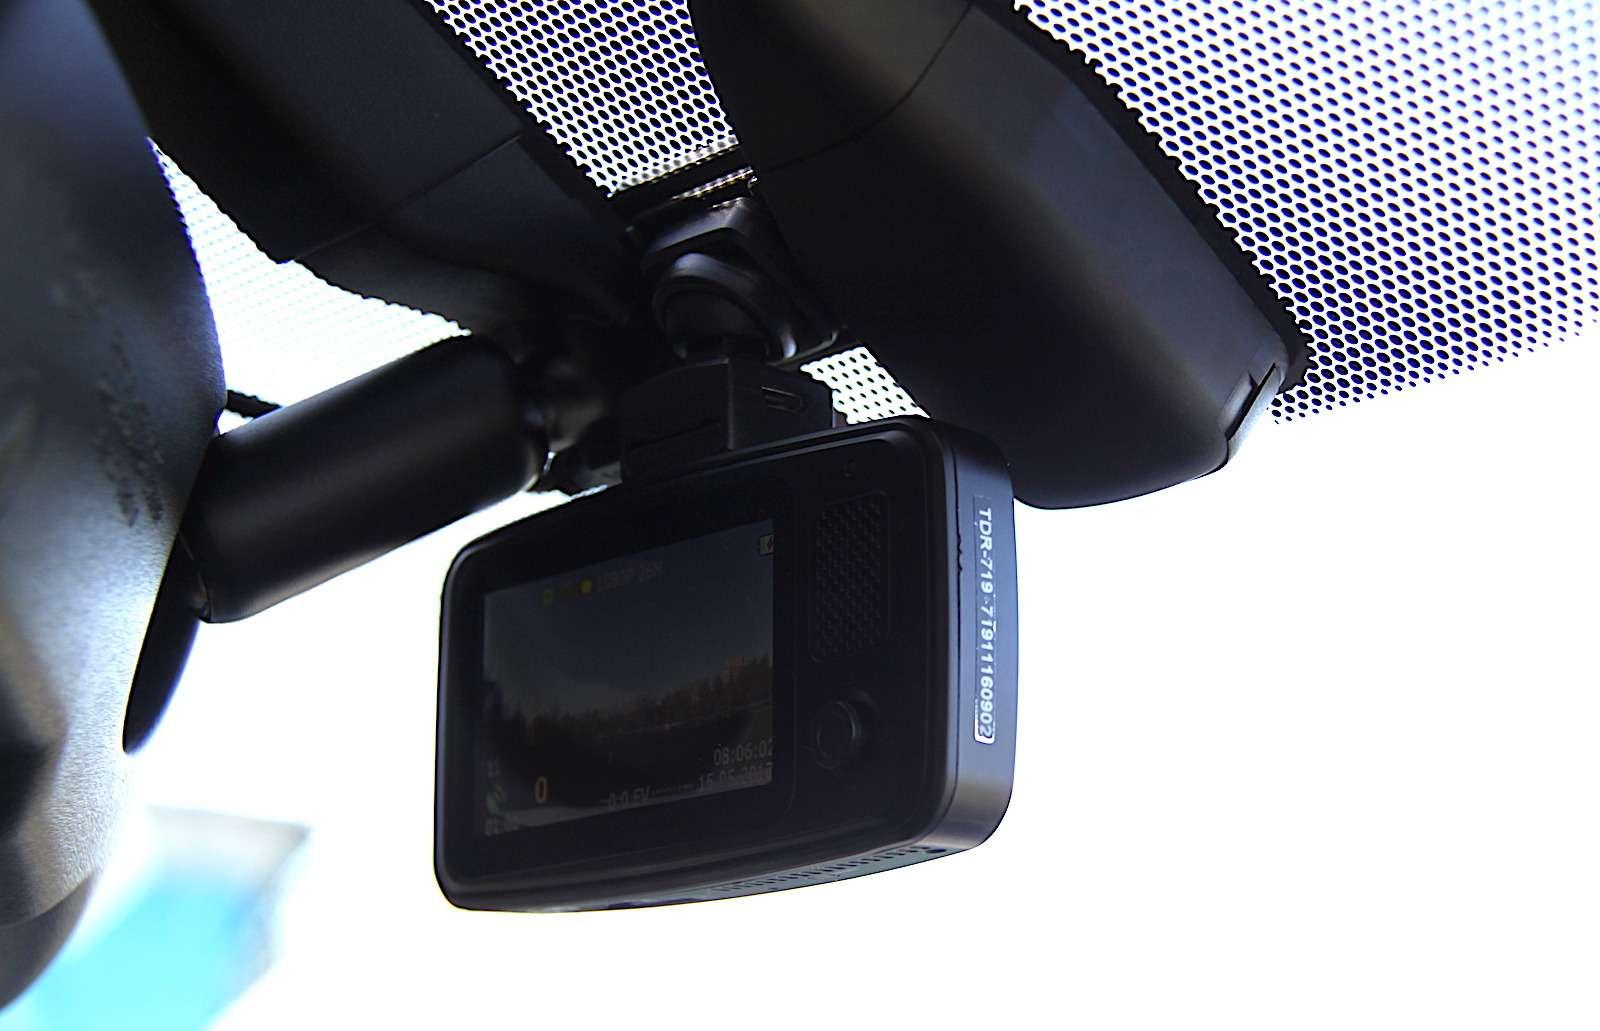 Тест видеорегистратора TrendVision TDR-719S: оптимизация— фото 752130